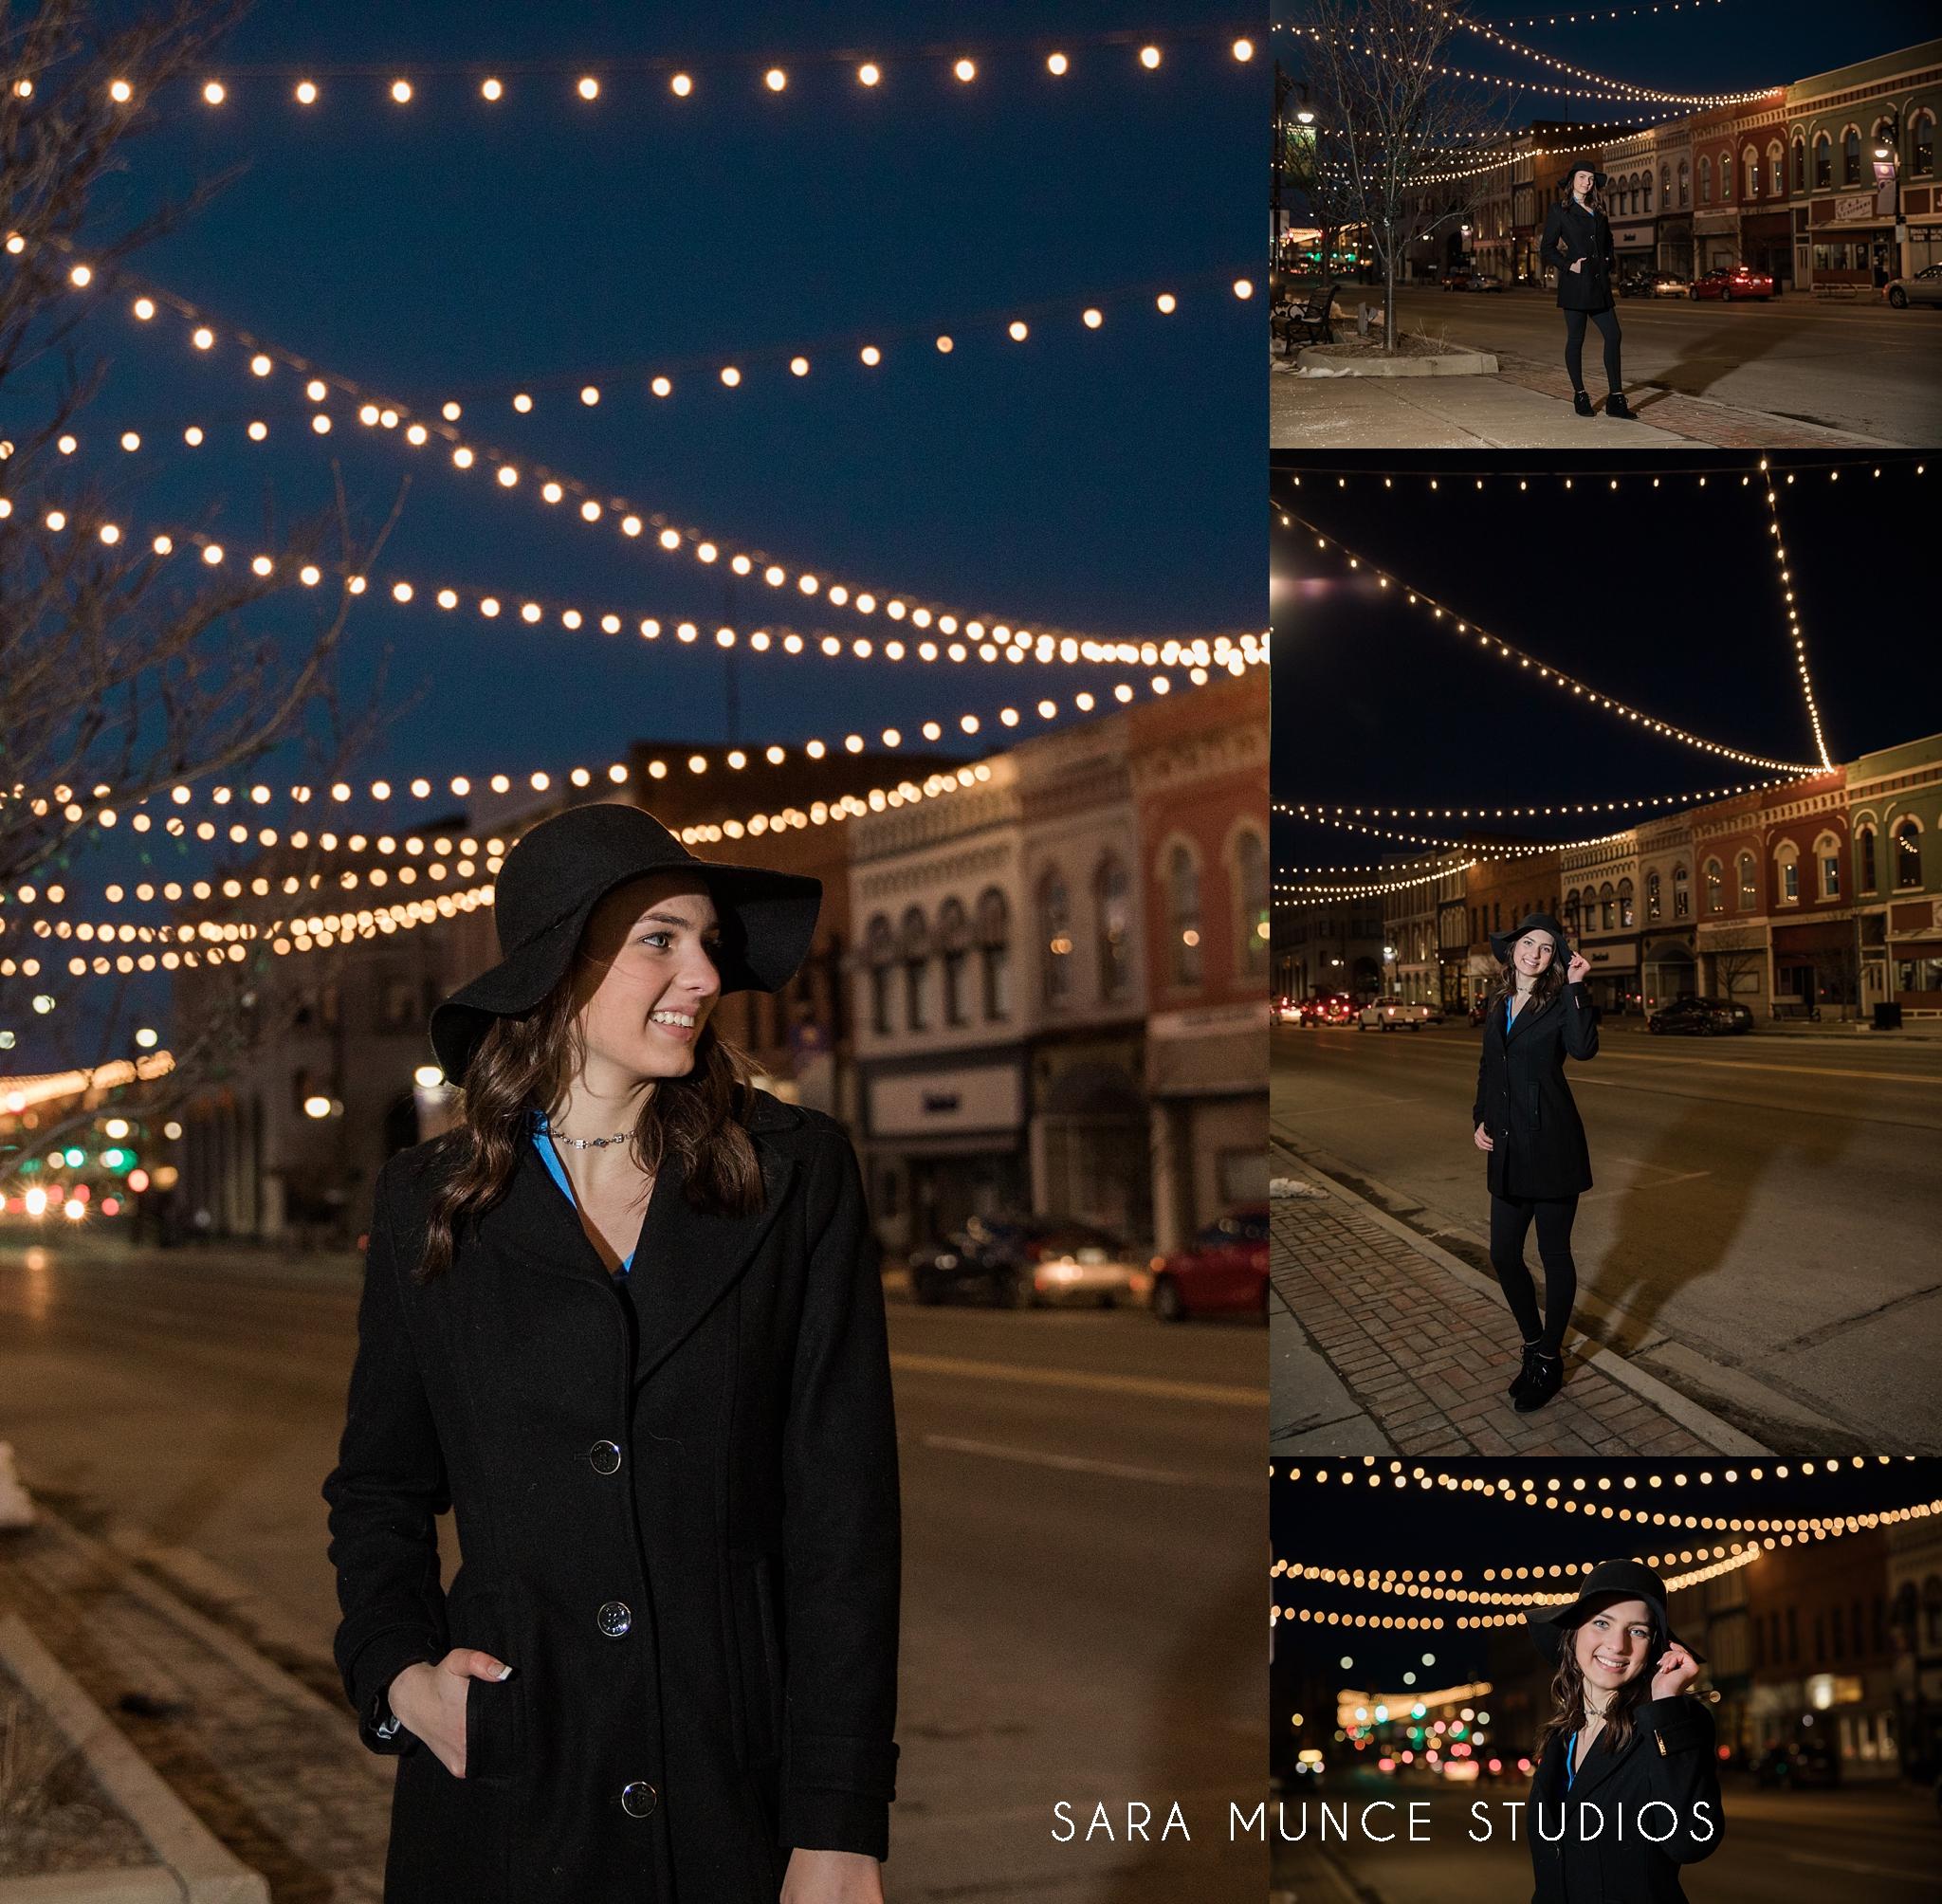 2018-04-18_downtownporthuronlights.jpg